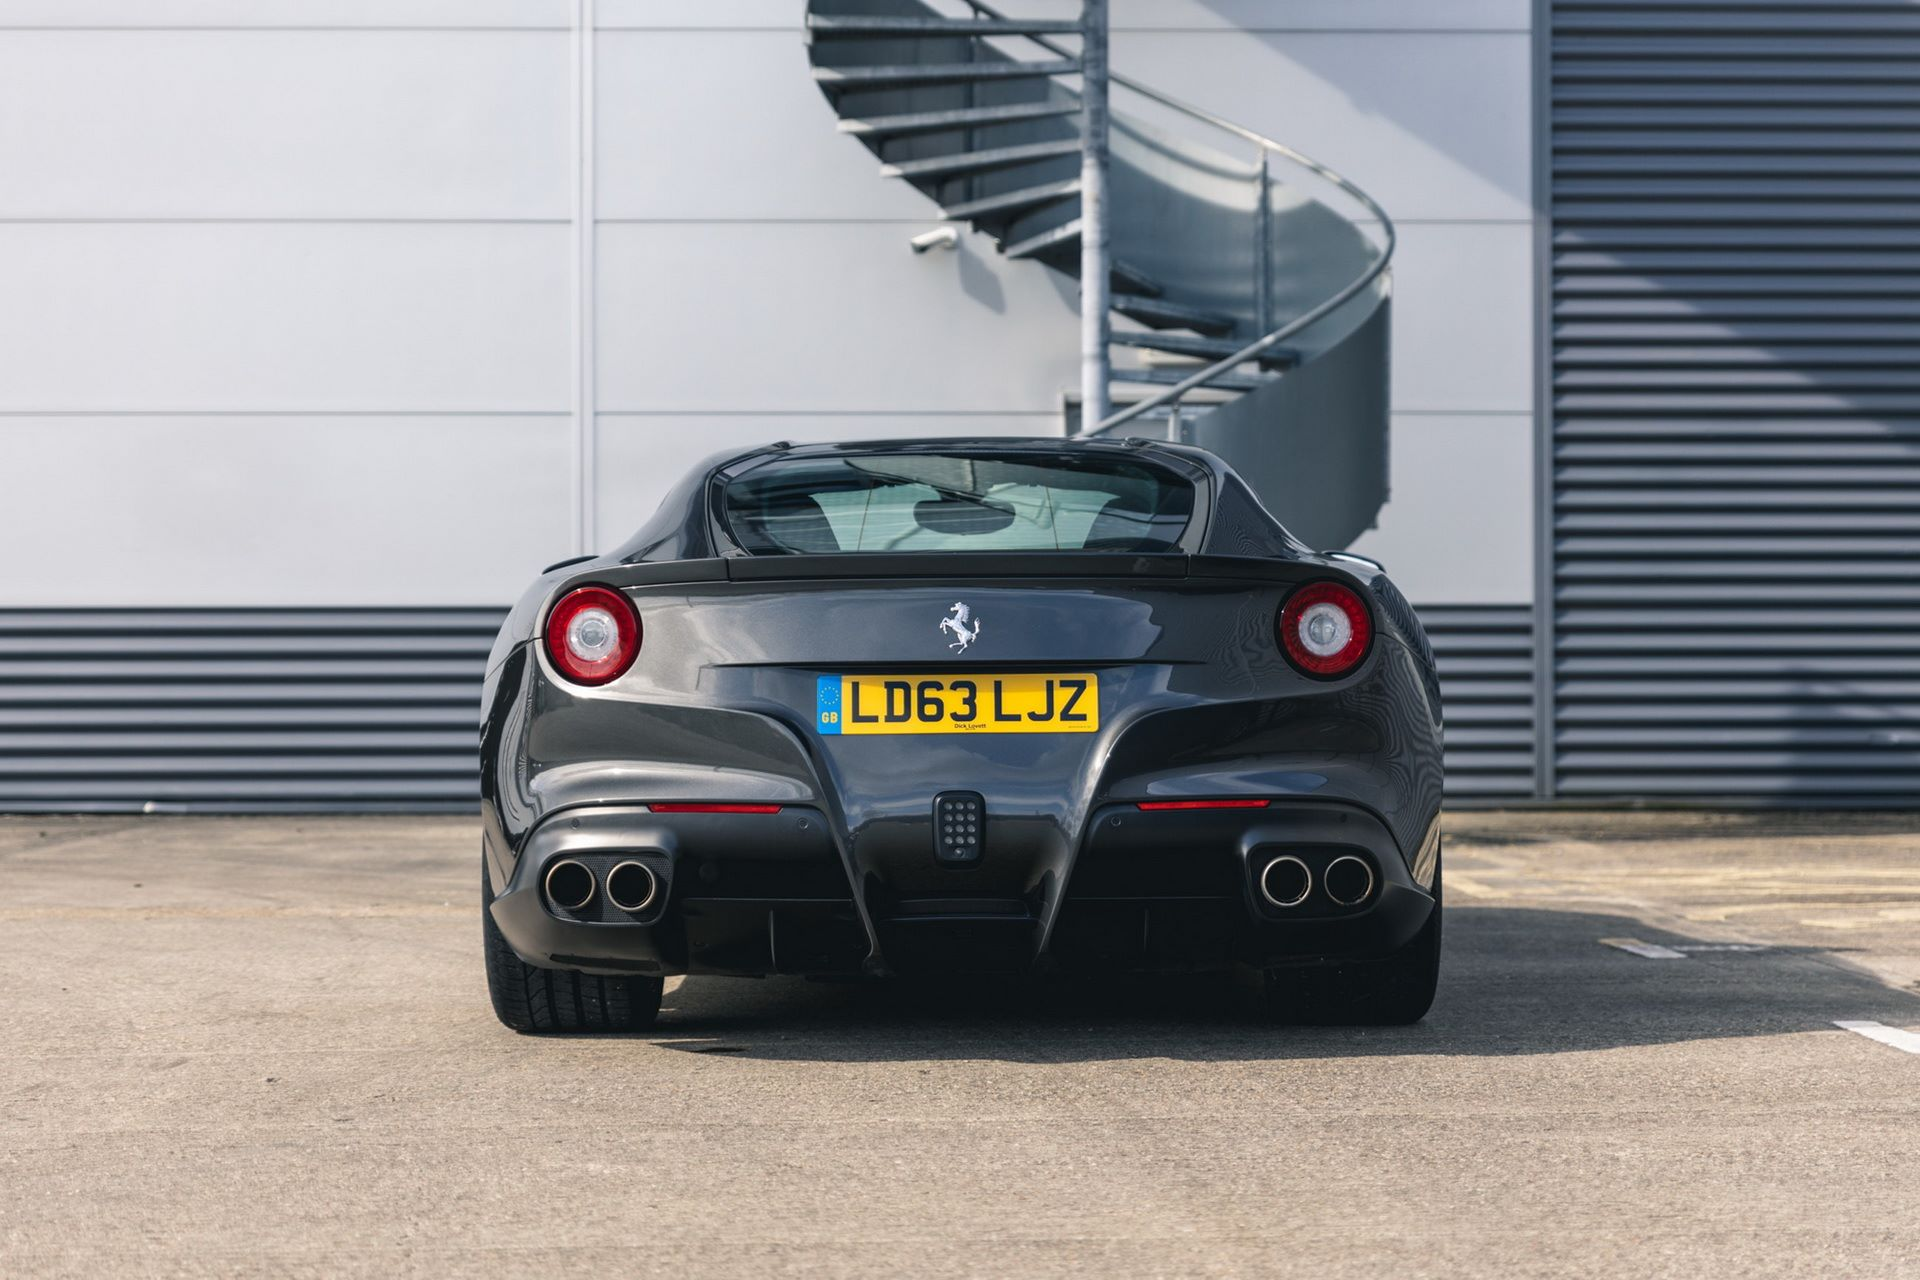 Ferrari-F12berlinetta-Chris-Harris-8